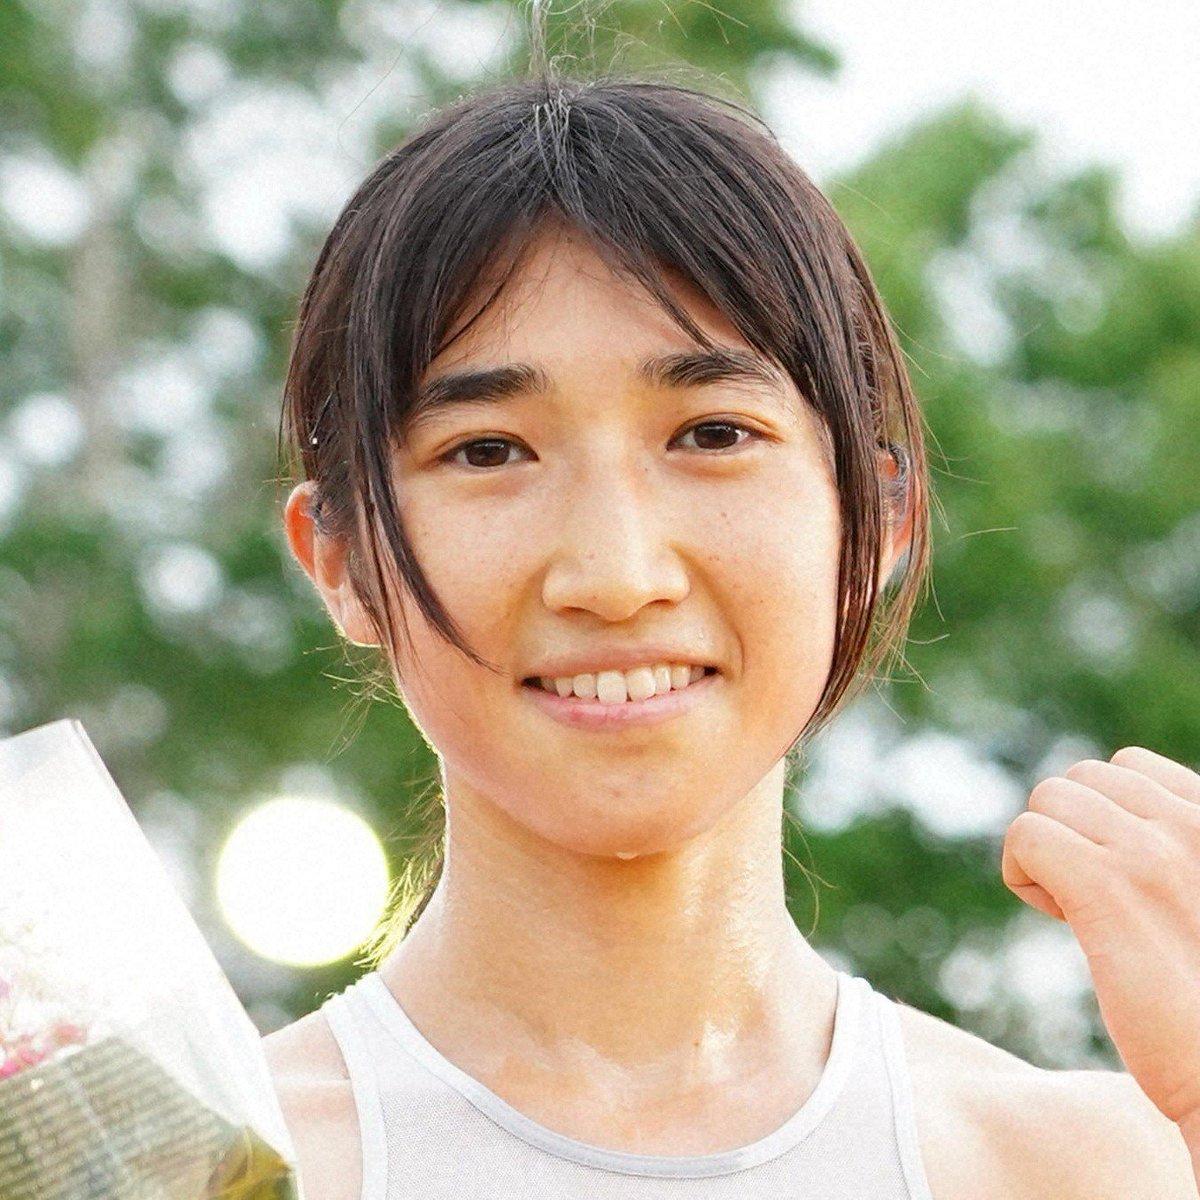 test ツイッターメディア - ワォワォ❗️田中希実選手❗️強烈❗️スッゲー❗️1500m4分02秒❗️これで女子としての日本人初3分台が見えてきた❗超人田中希実選手なら可能だ❗ https://t.co/PfRur8baKL